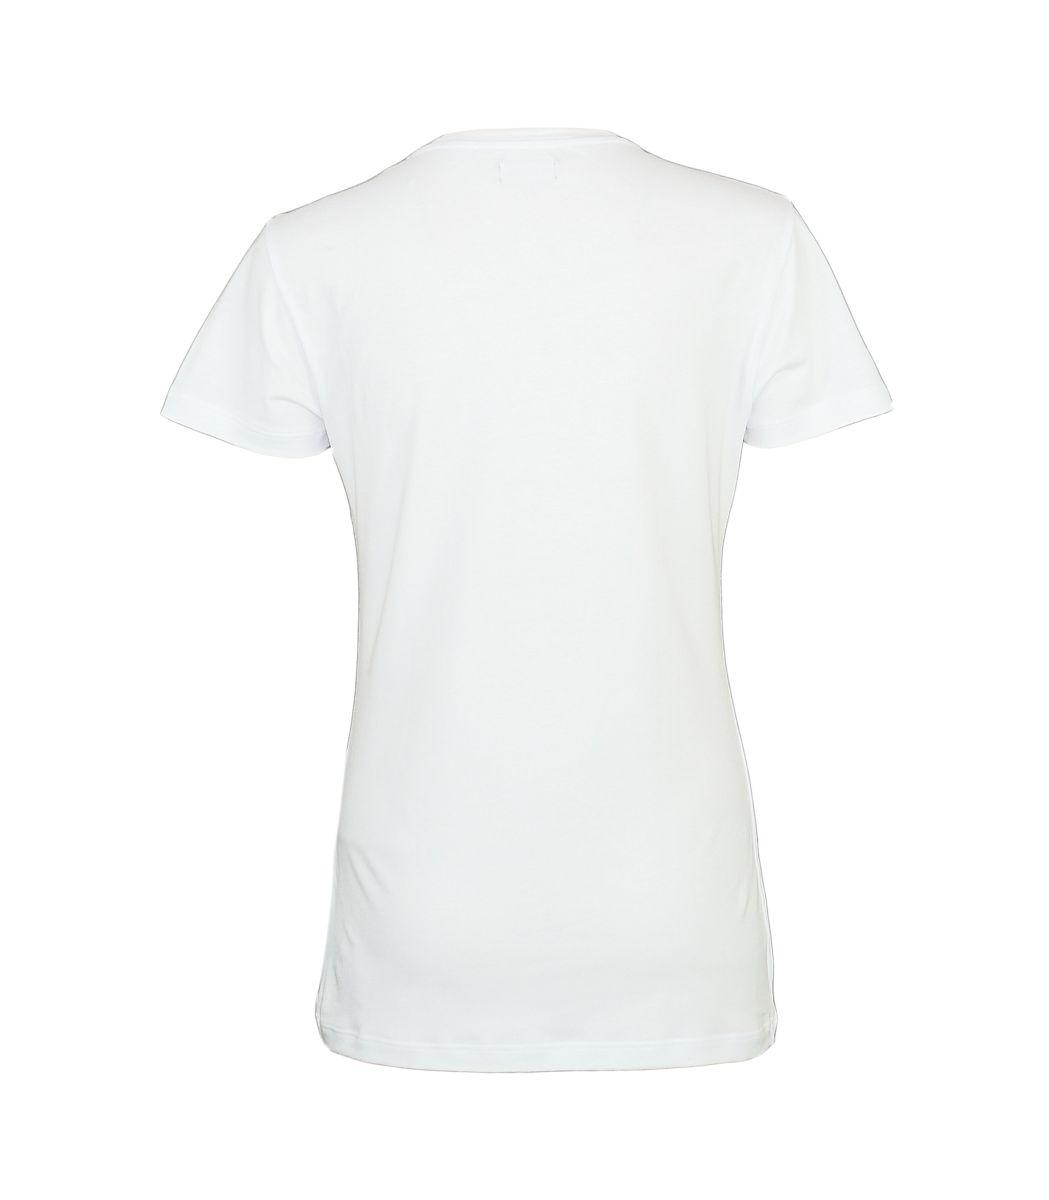 Emporio Armani Damen Shirt T-Shirt Rundhals 163139 7A263 00010 BIANCO HW17-EADS1